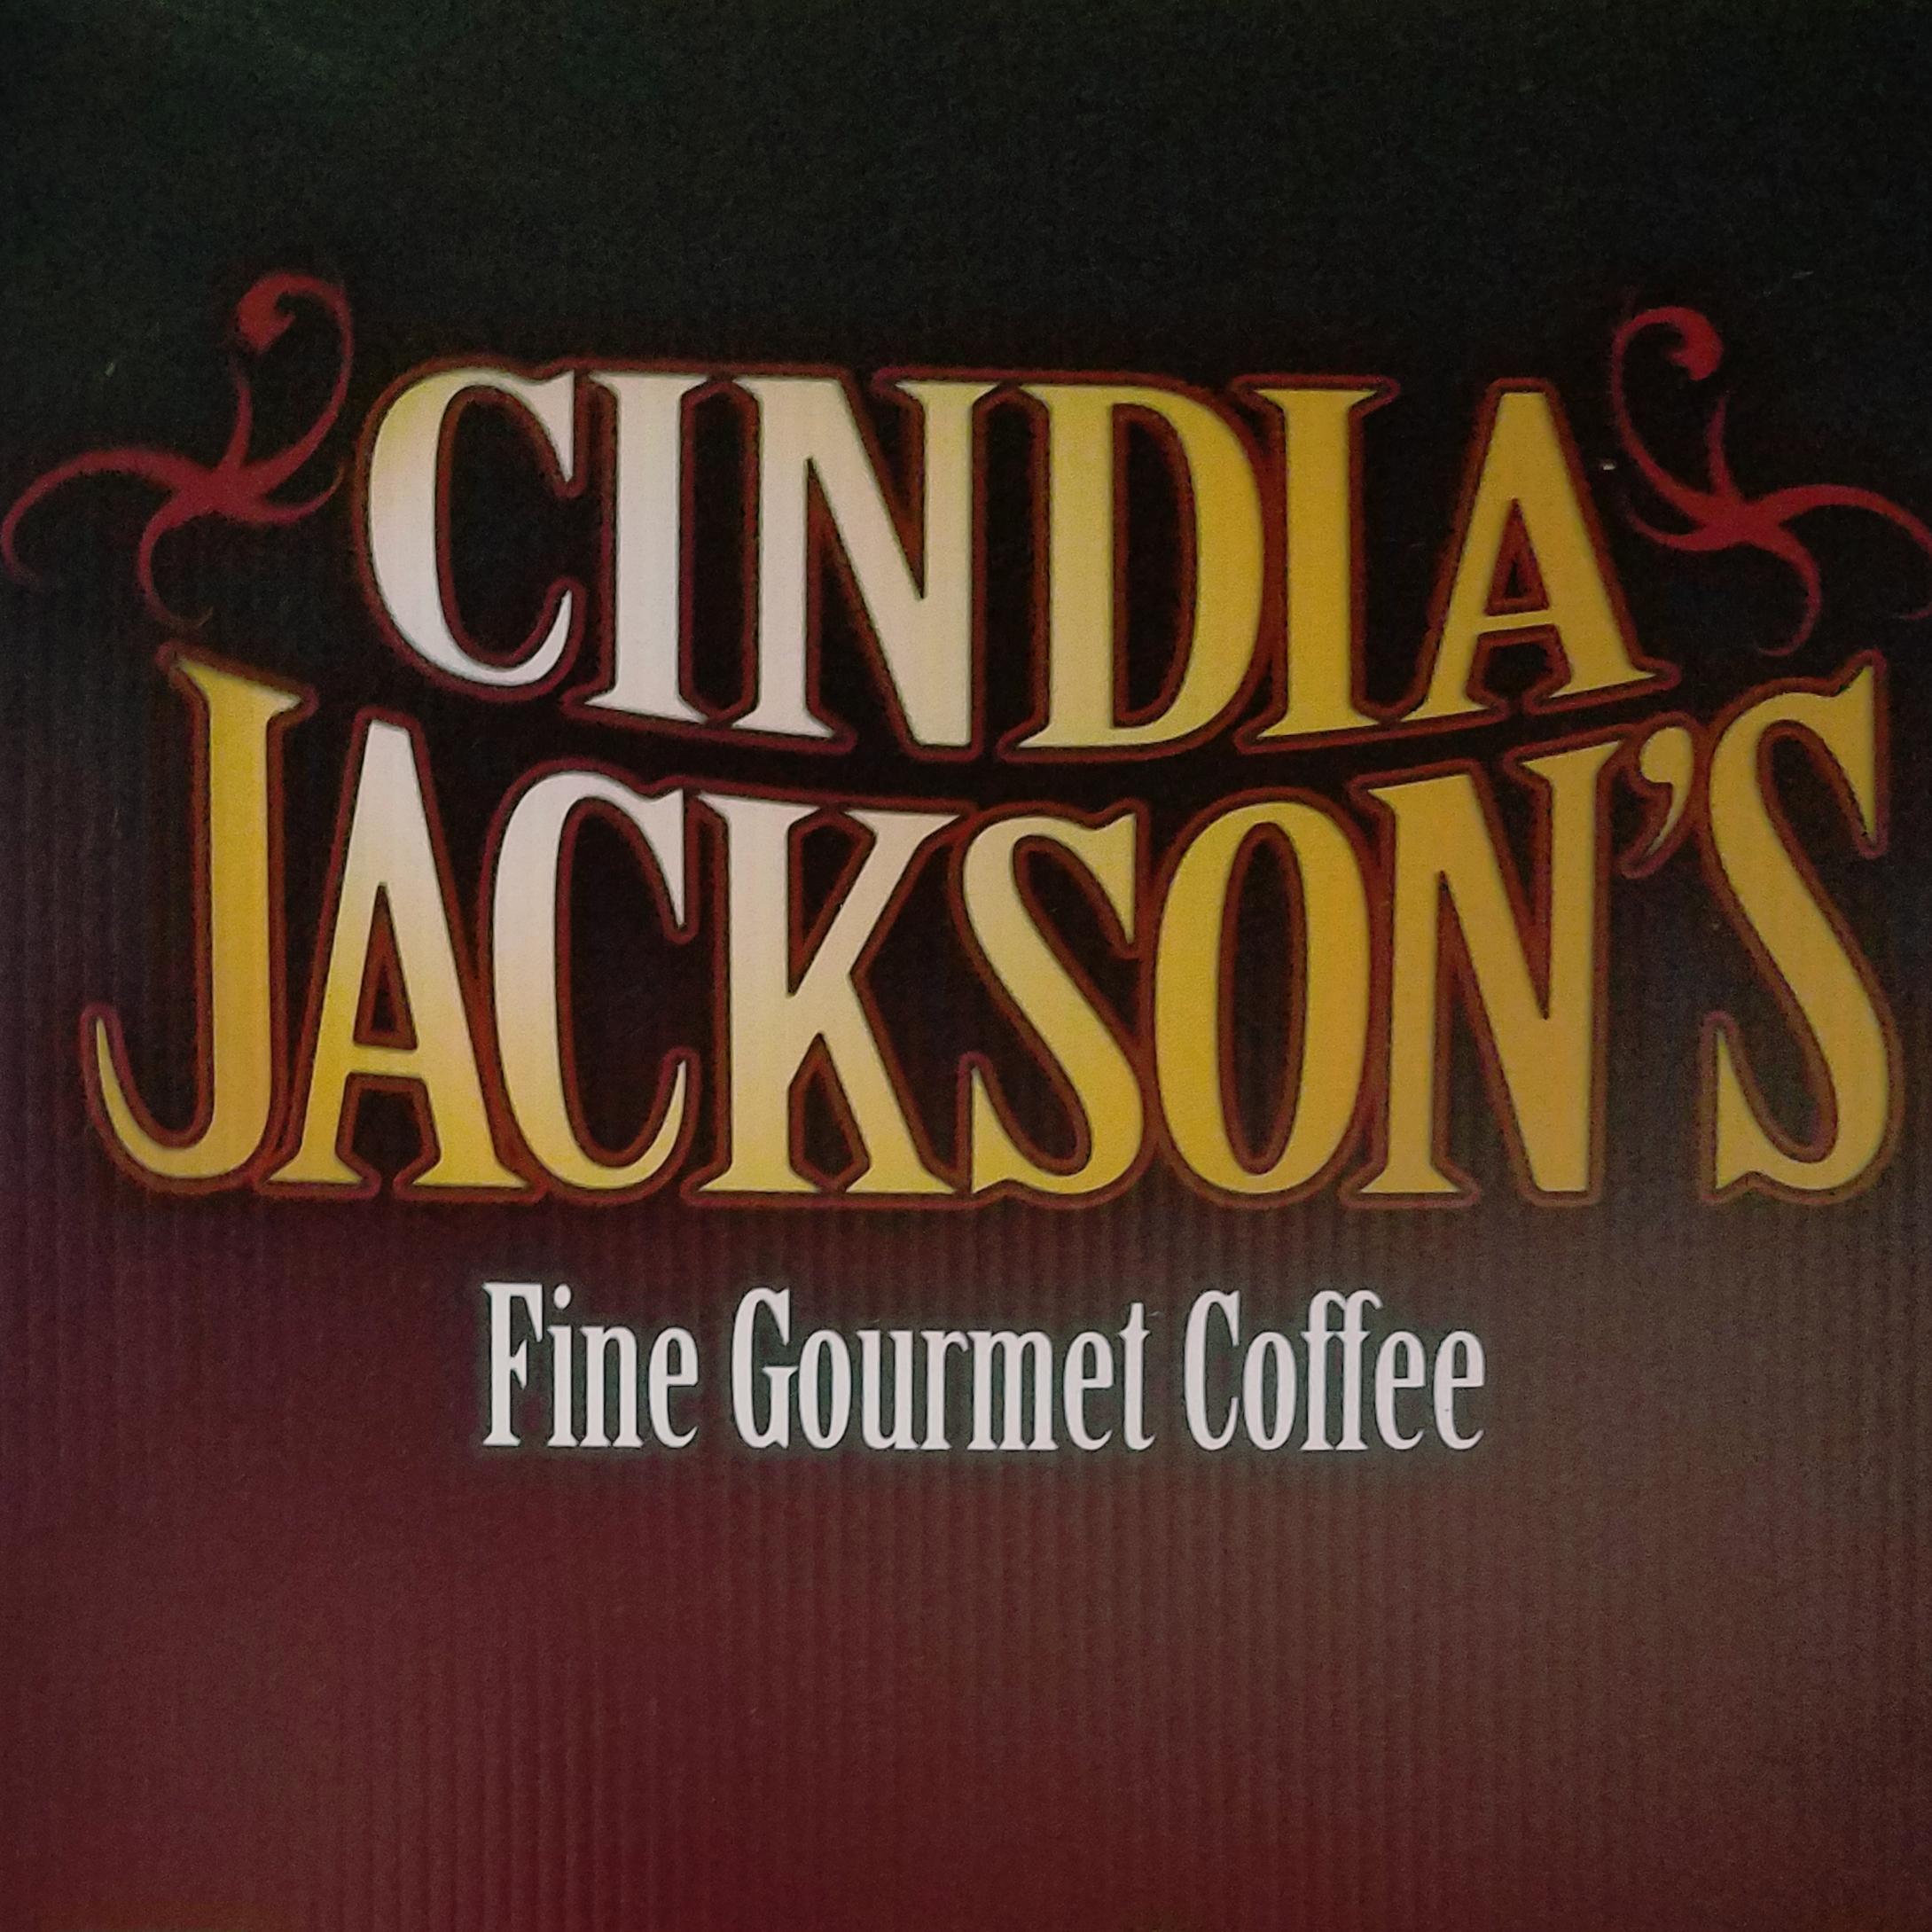 Cindia Jackson's Fine Gourmet Coffee